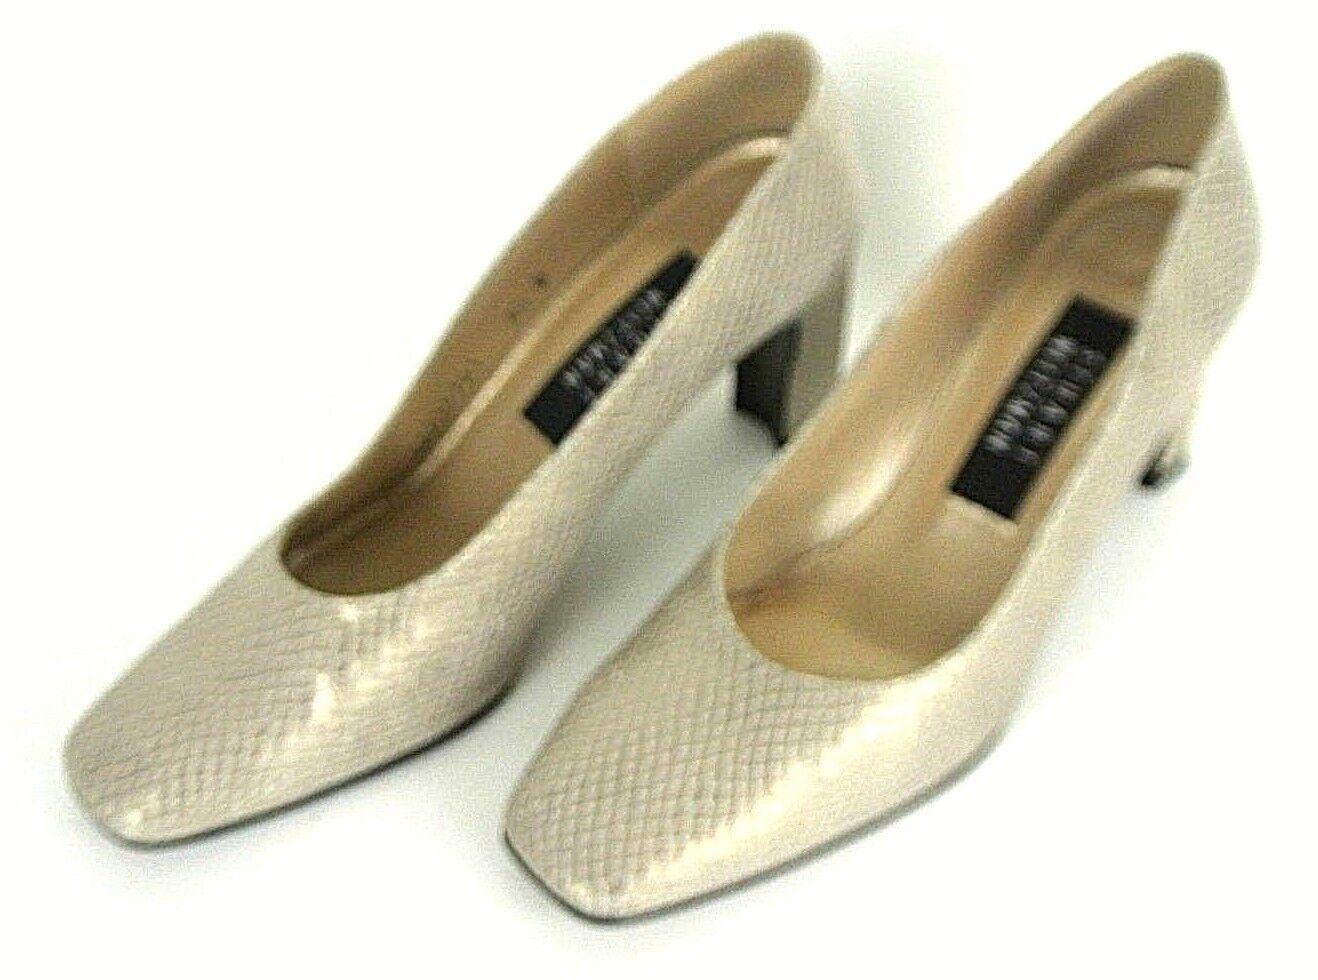 Stuart Weitzman Pumps Damenschuhe Schuhes Chunky Metallic Gold Leder Chunky Schuhes Heel 6.5 1008 6aedef